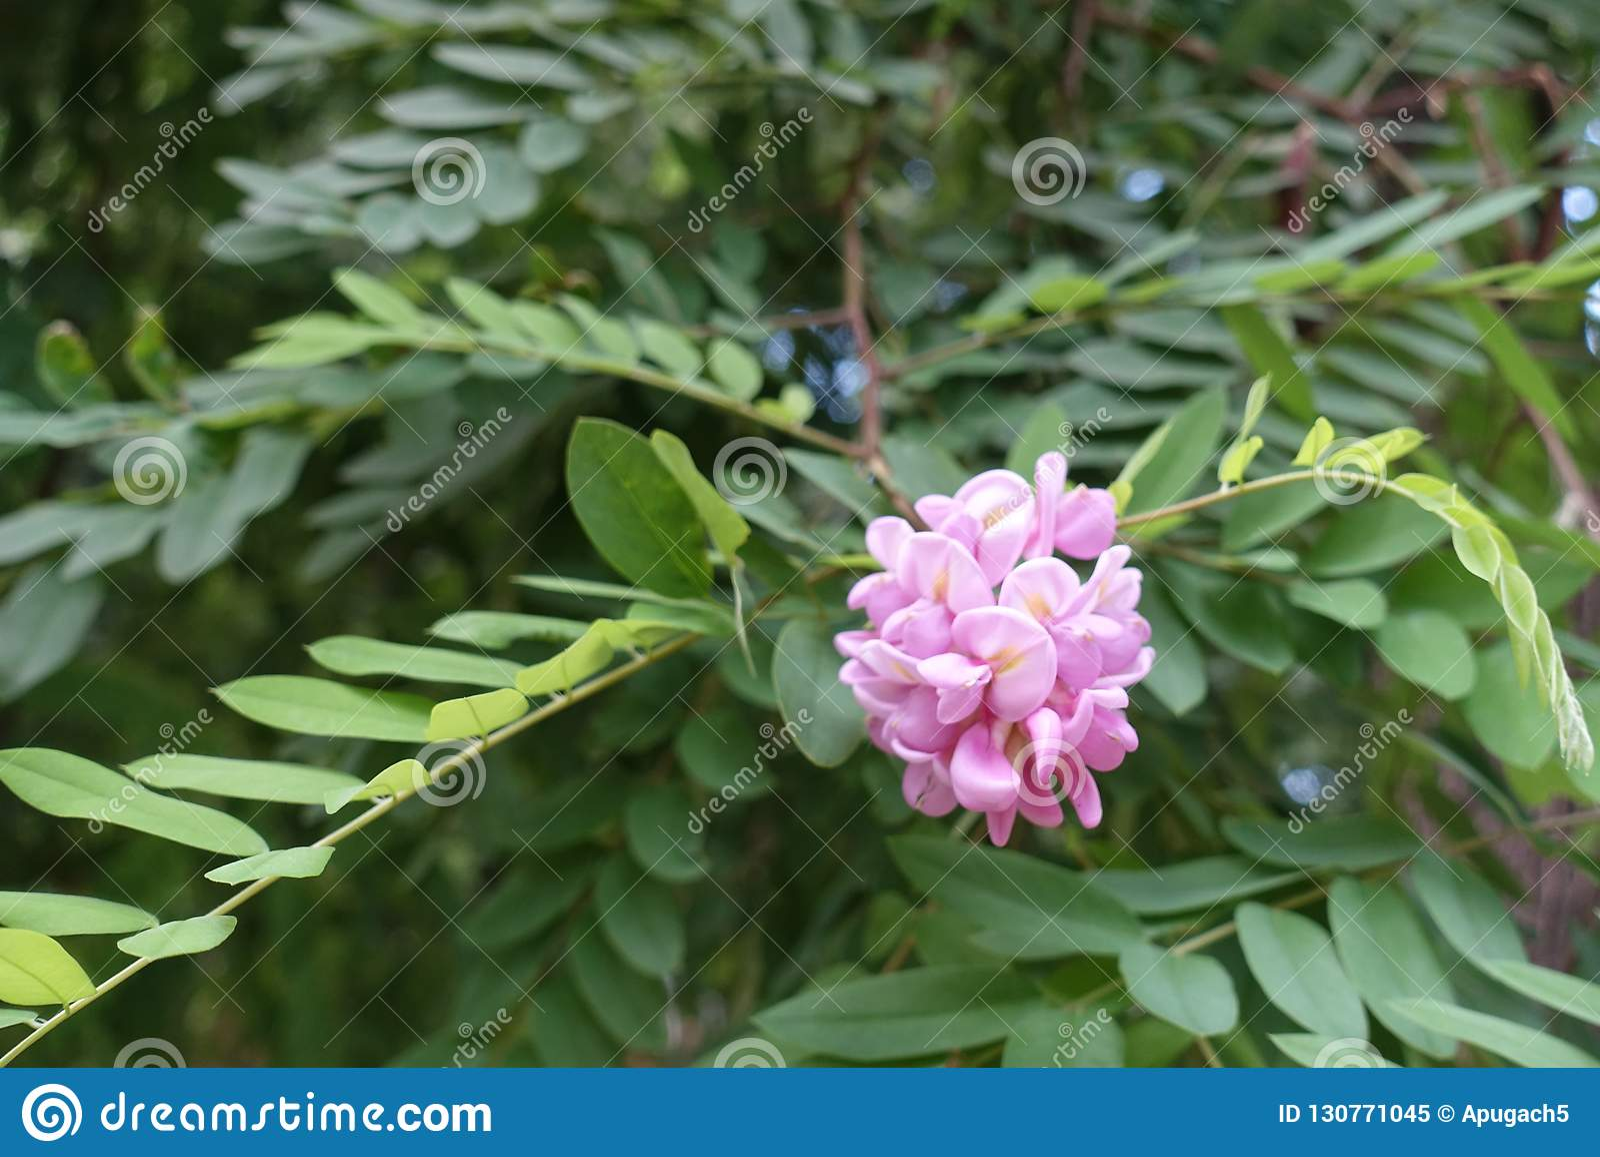 Rose Pink Flowers Of Robinia Hispida Borne In Panicle Stock Image